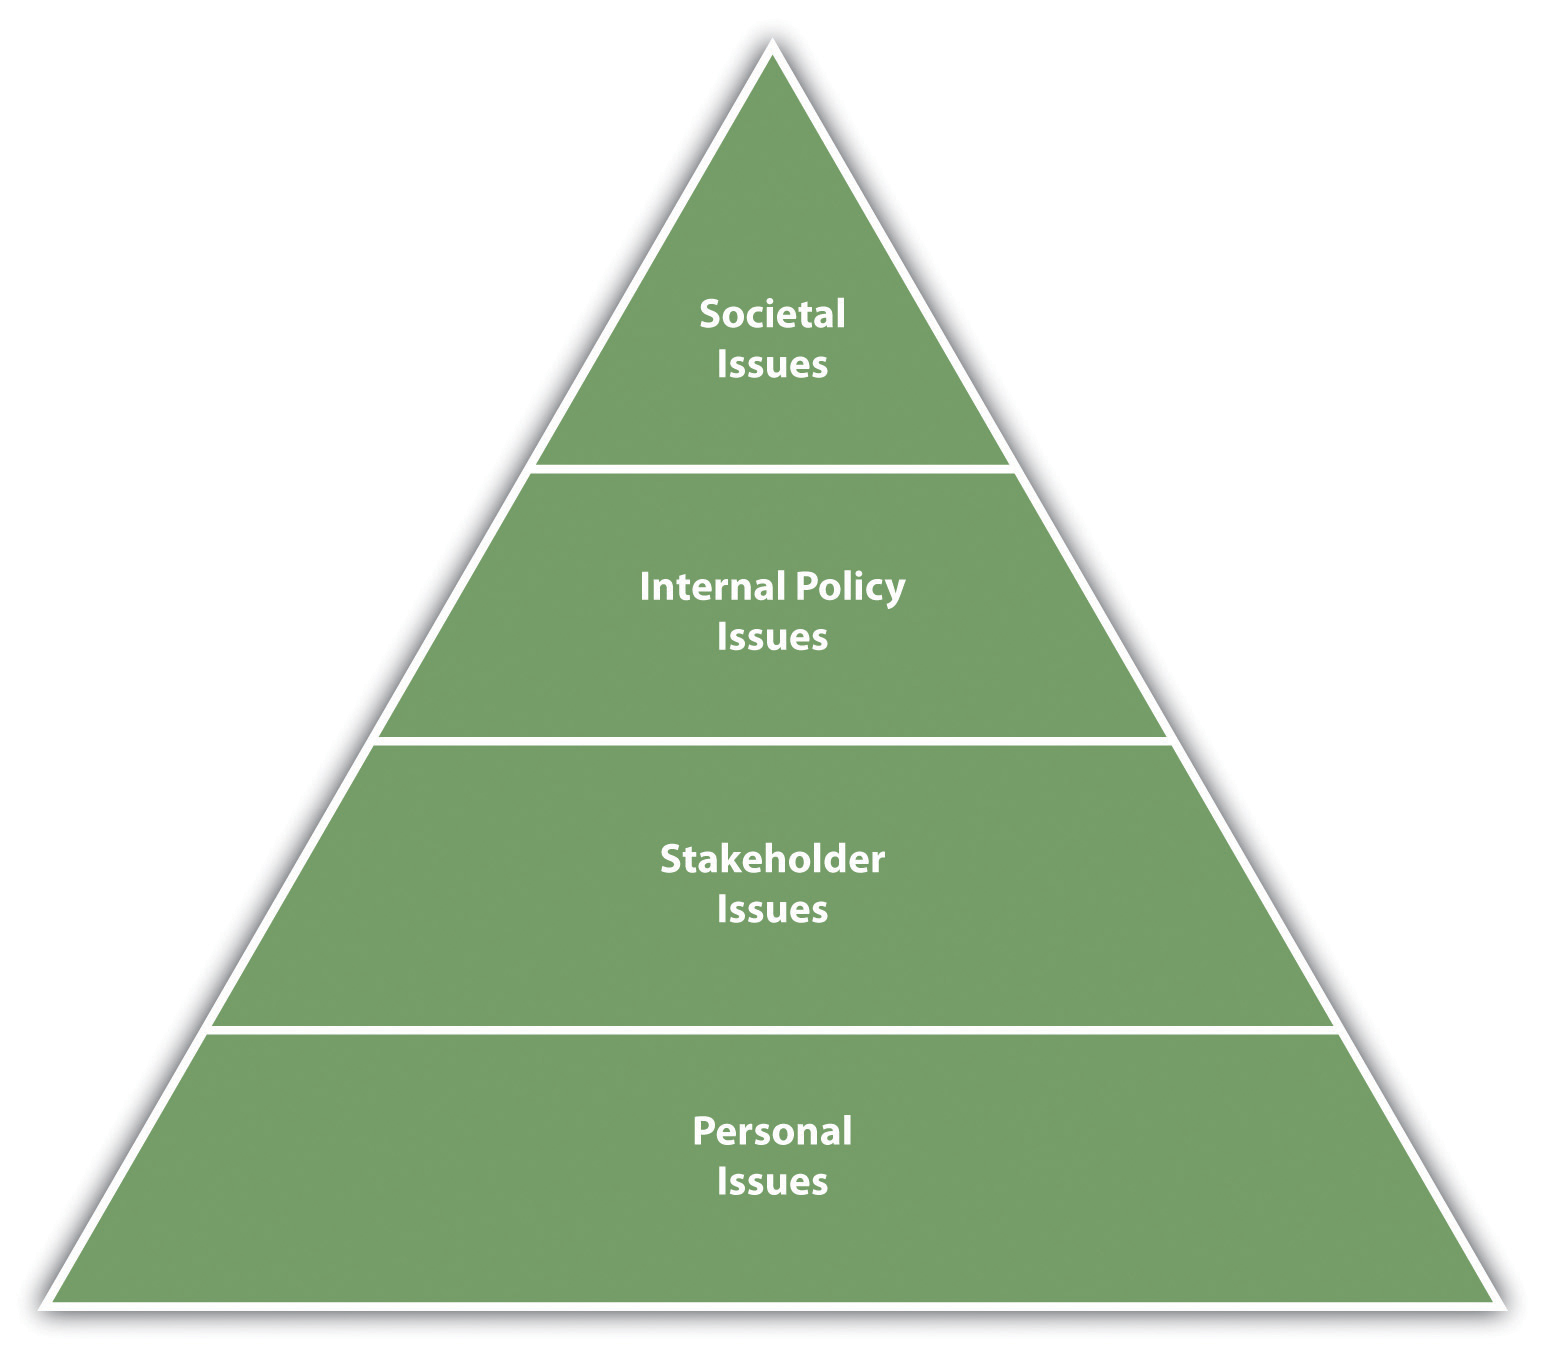 human relations flatworld levels of ethics an organizational framework